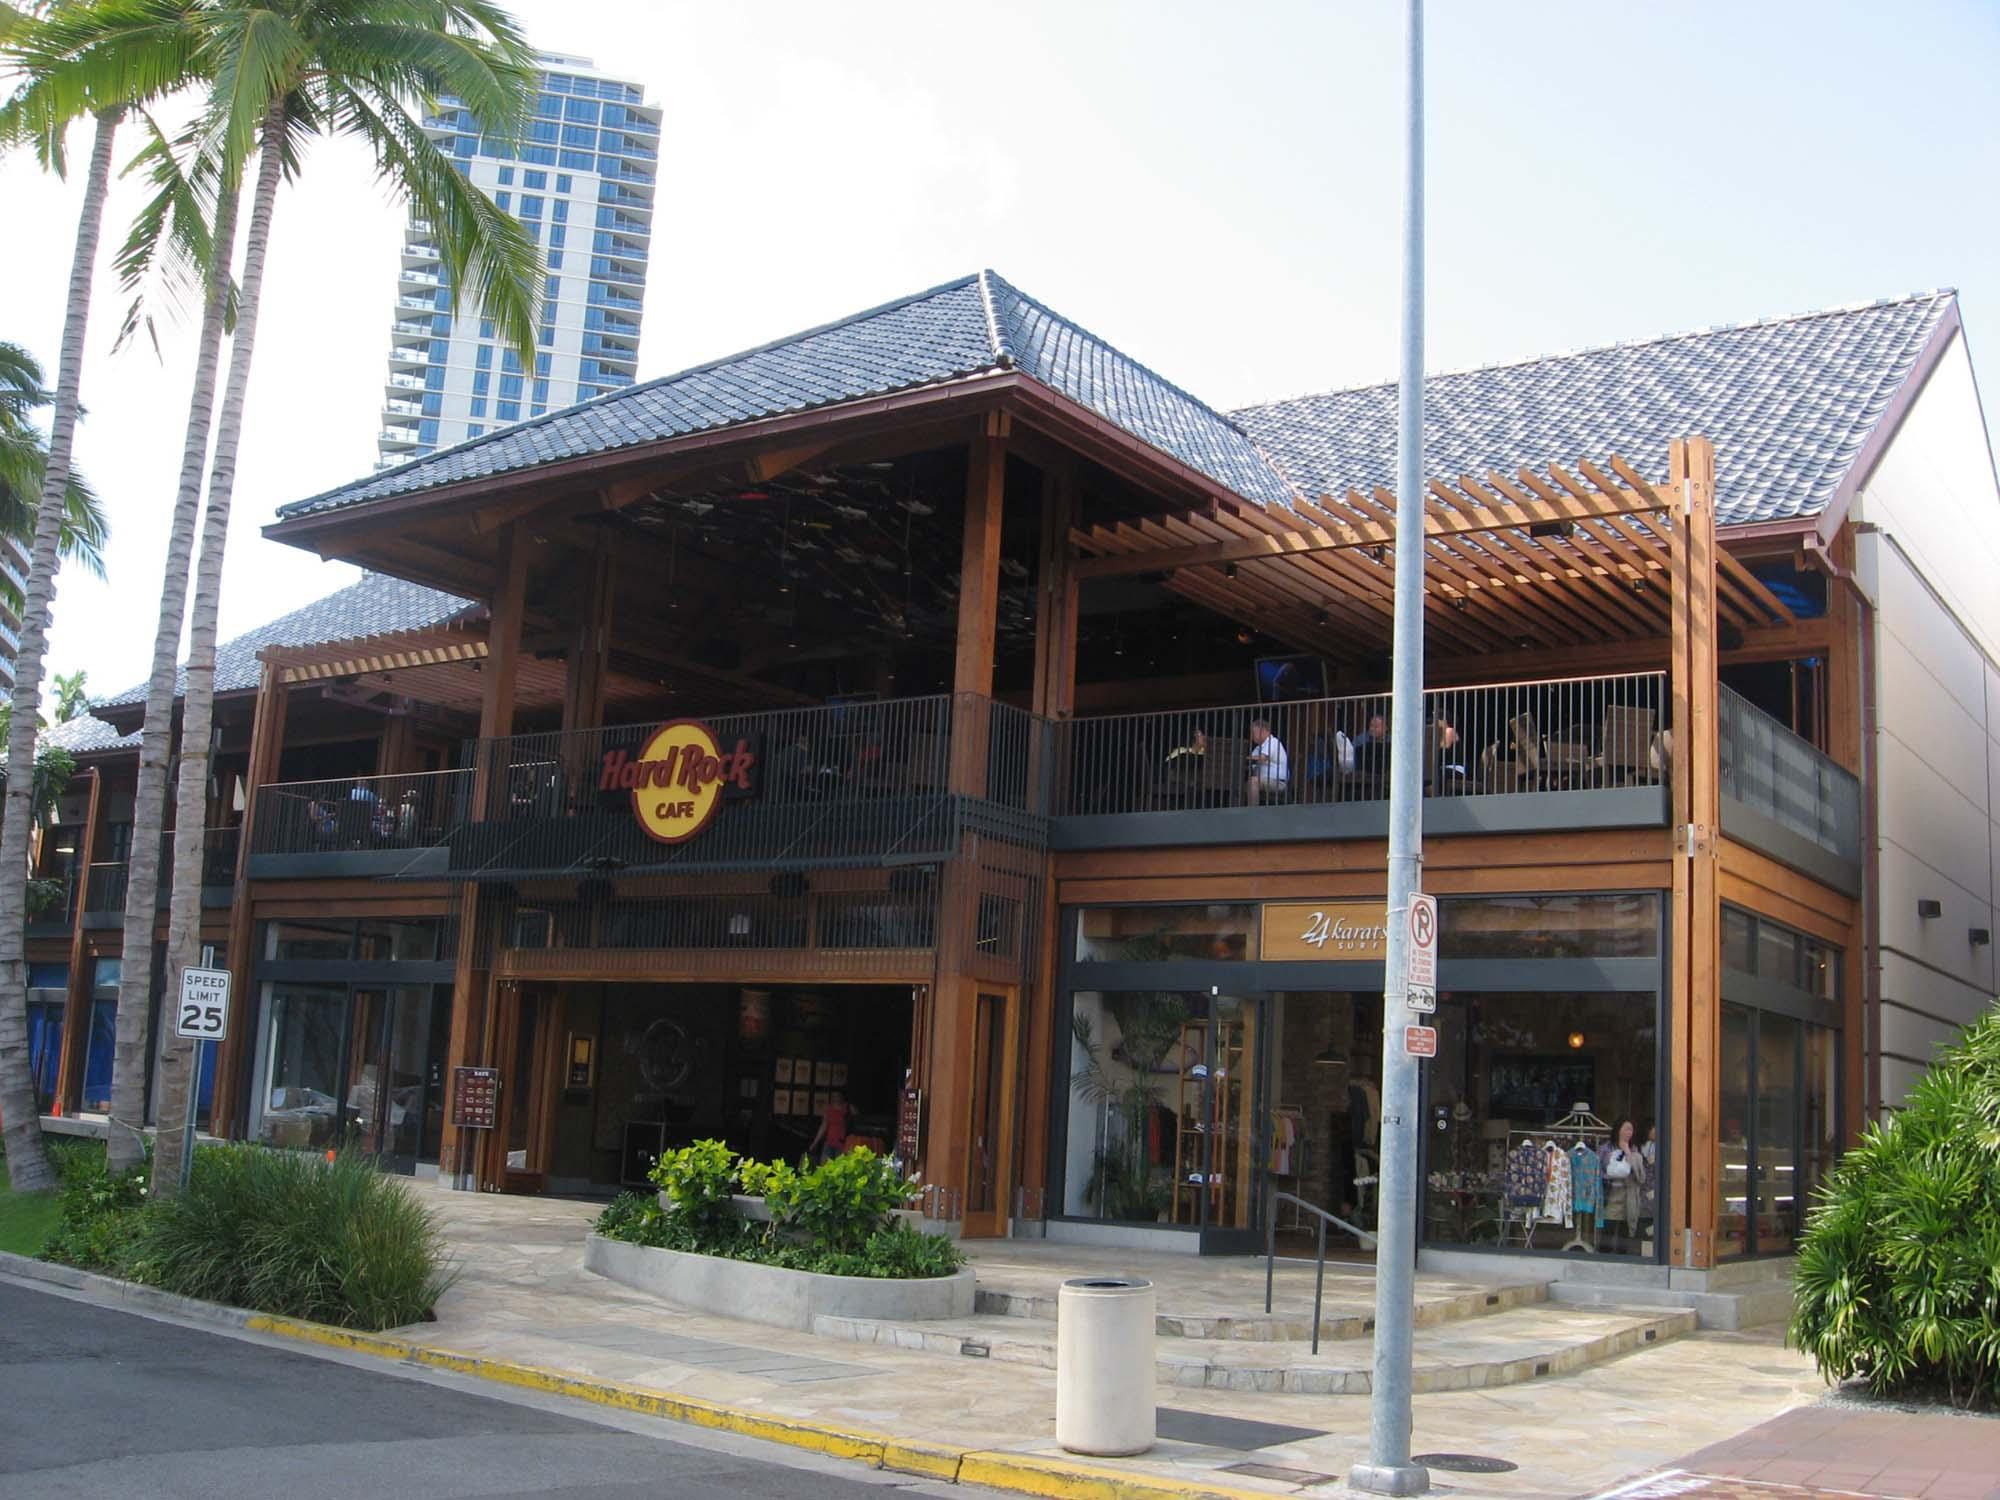 The Hard Rock showcases the 280 Beach Walk retail complex in Waikiki